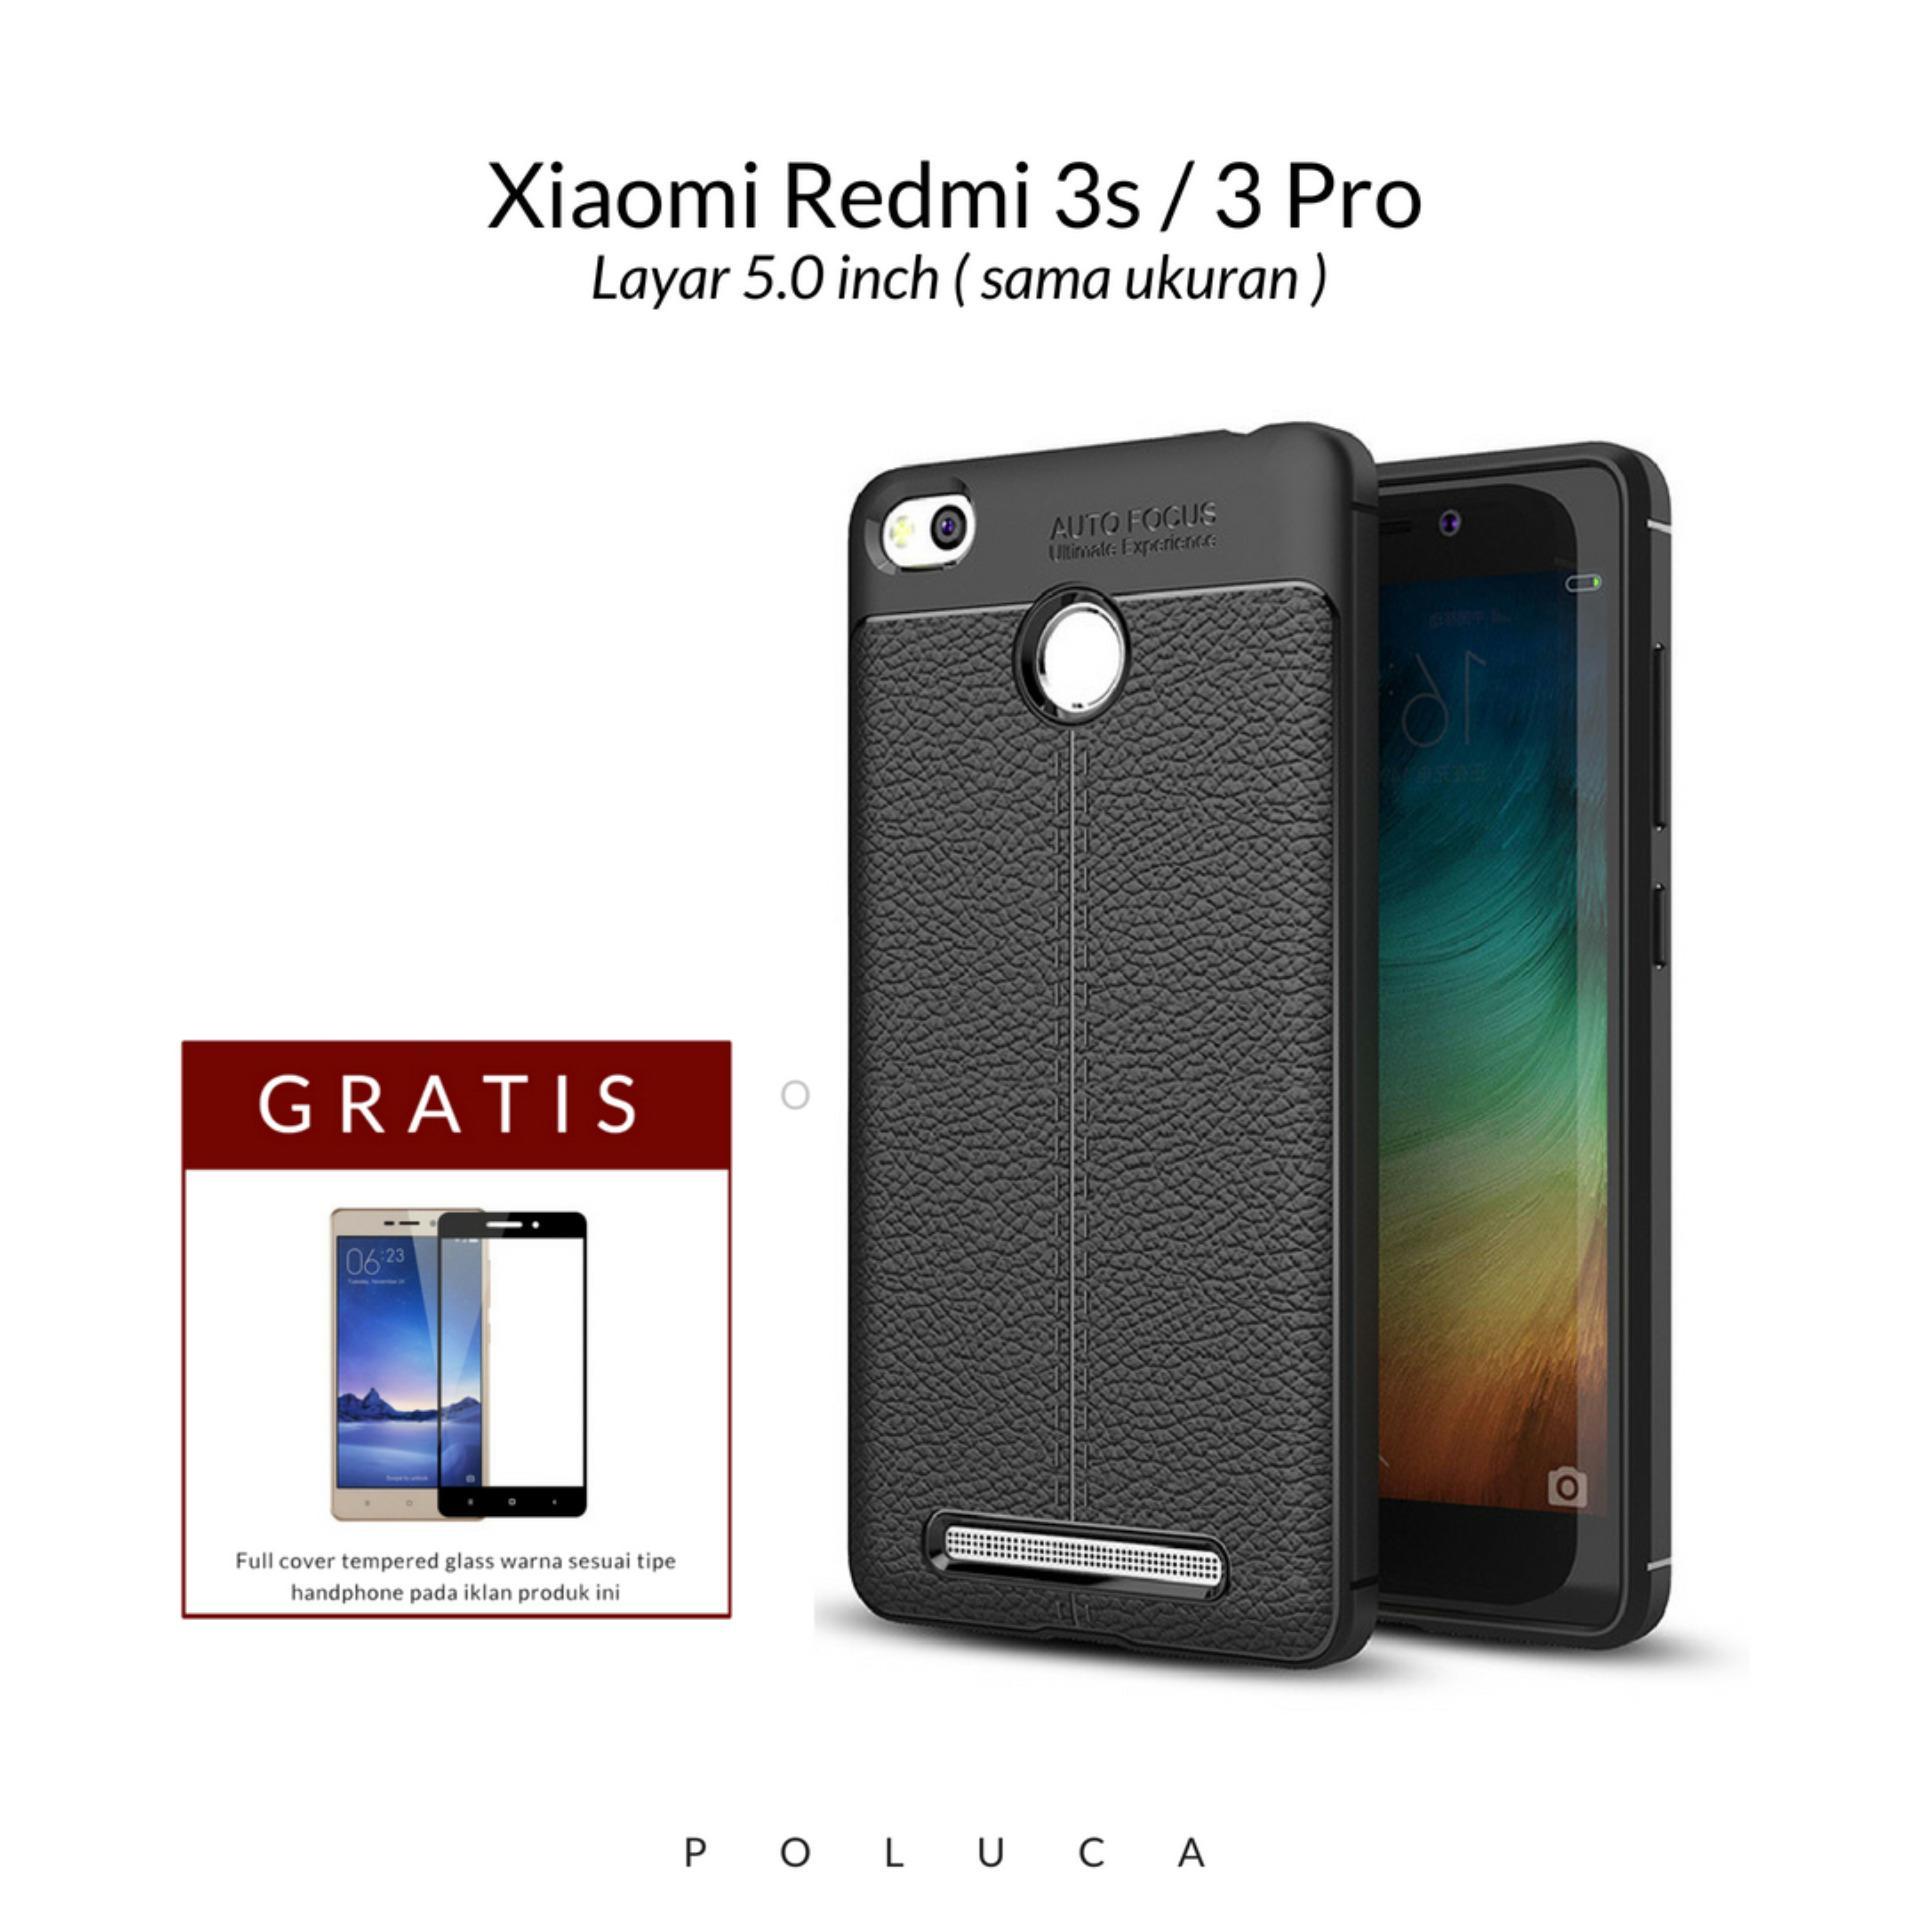 Poluca Luxury Case For Xiaomi Redmi 3 Pro / 3s Ultimate Experience TPU Leather Autofocus -